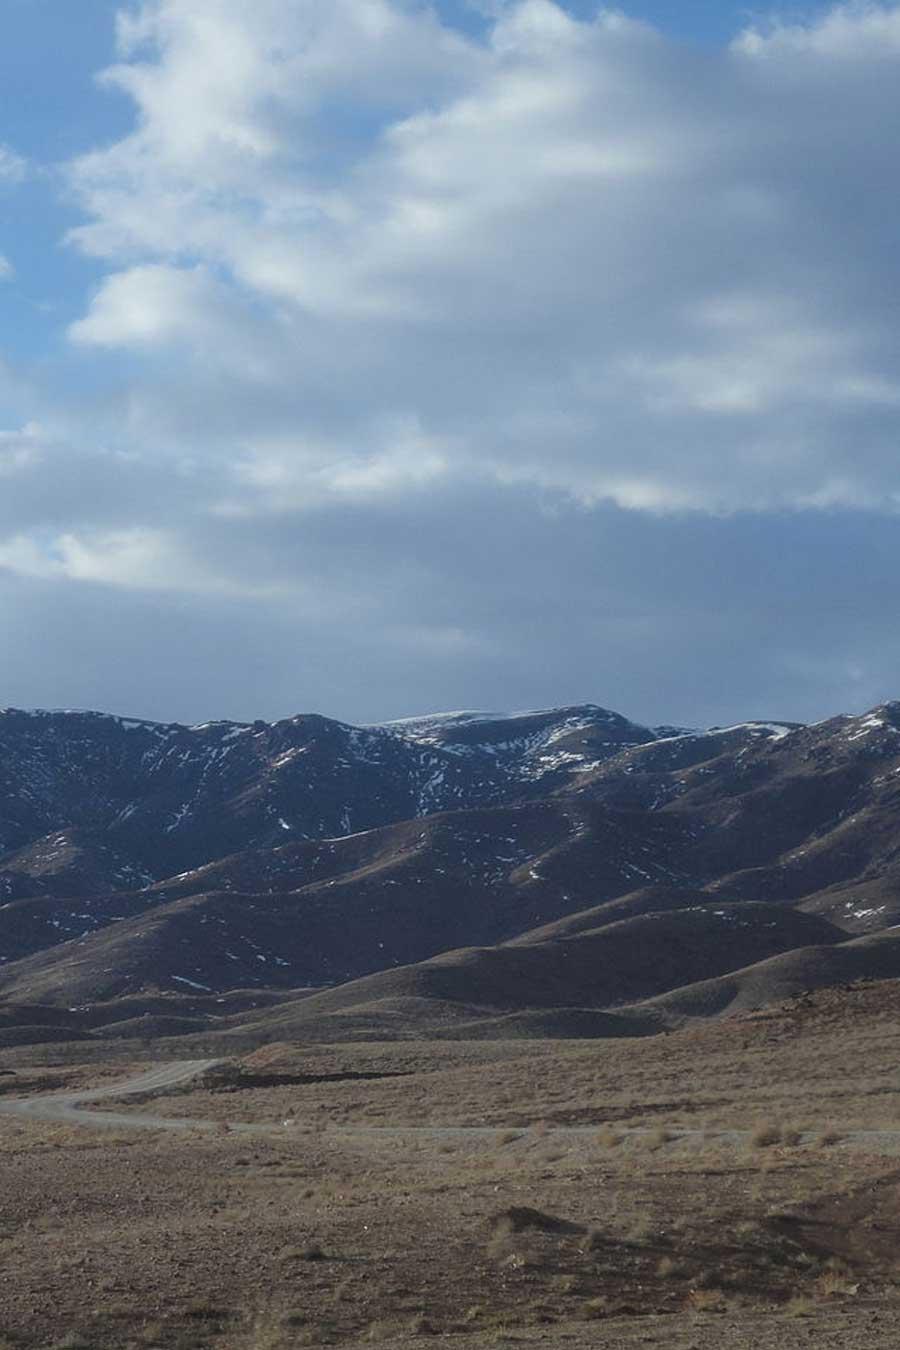 Paysage de la région de Khorasan-e Razavi, en Iran